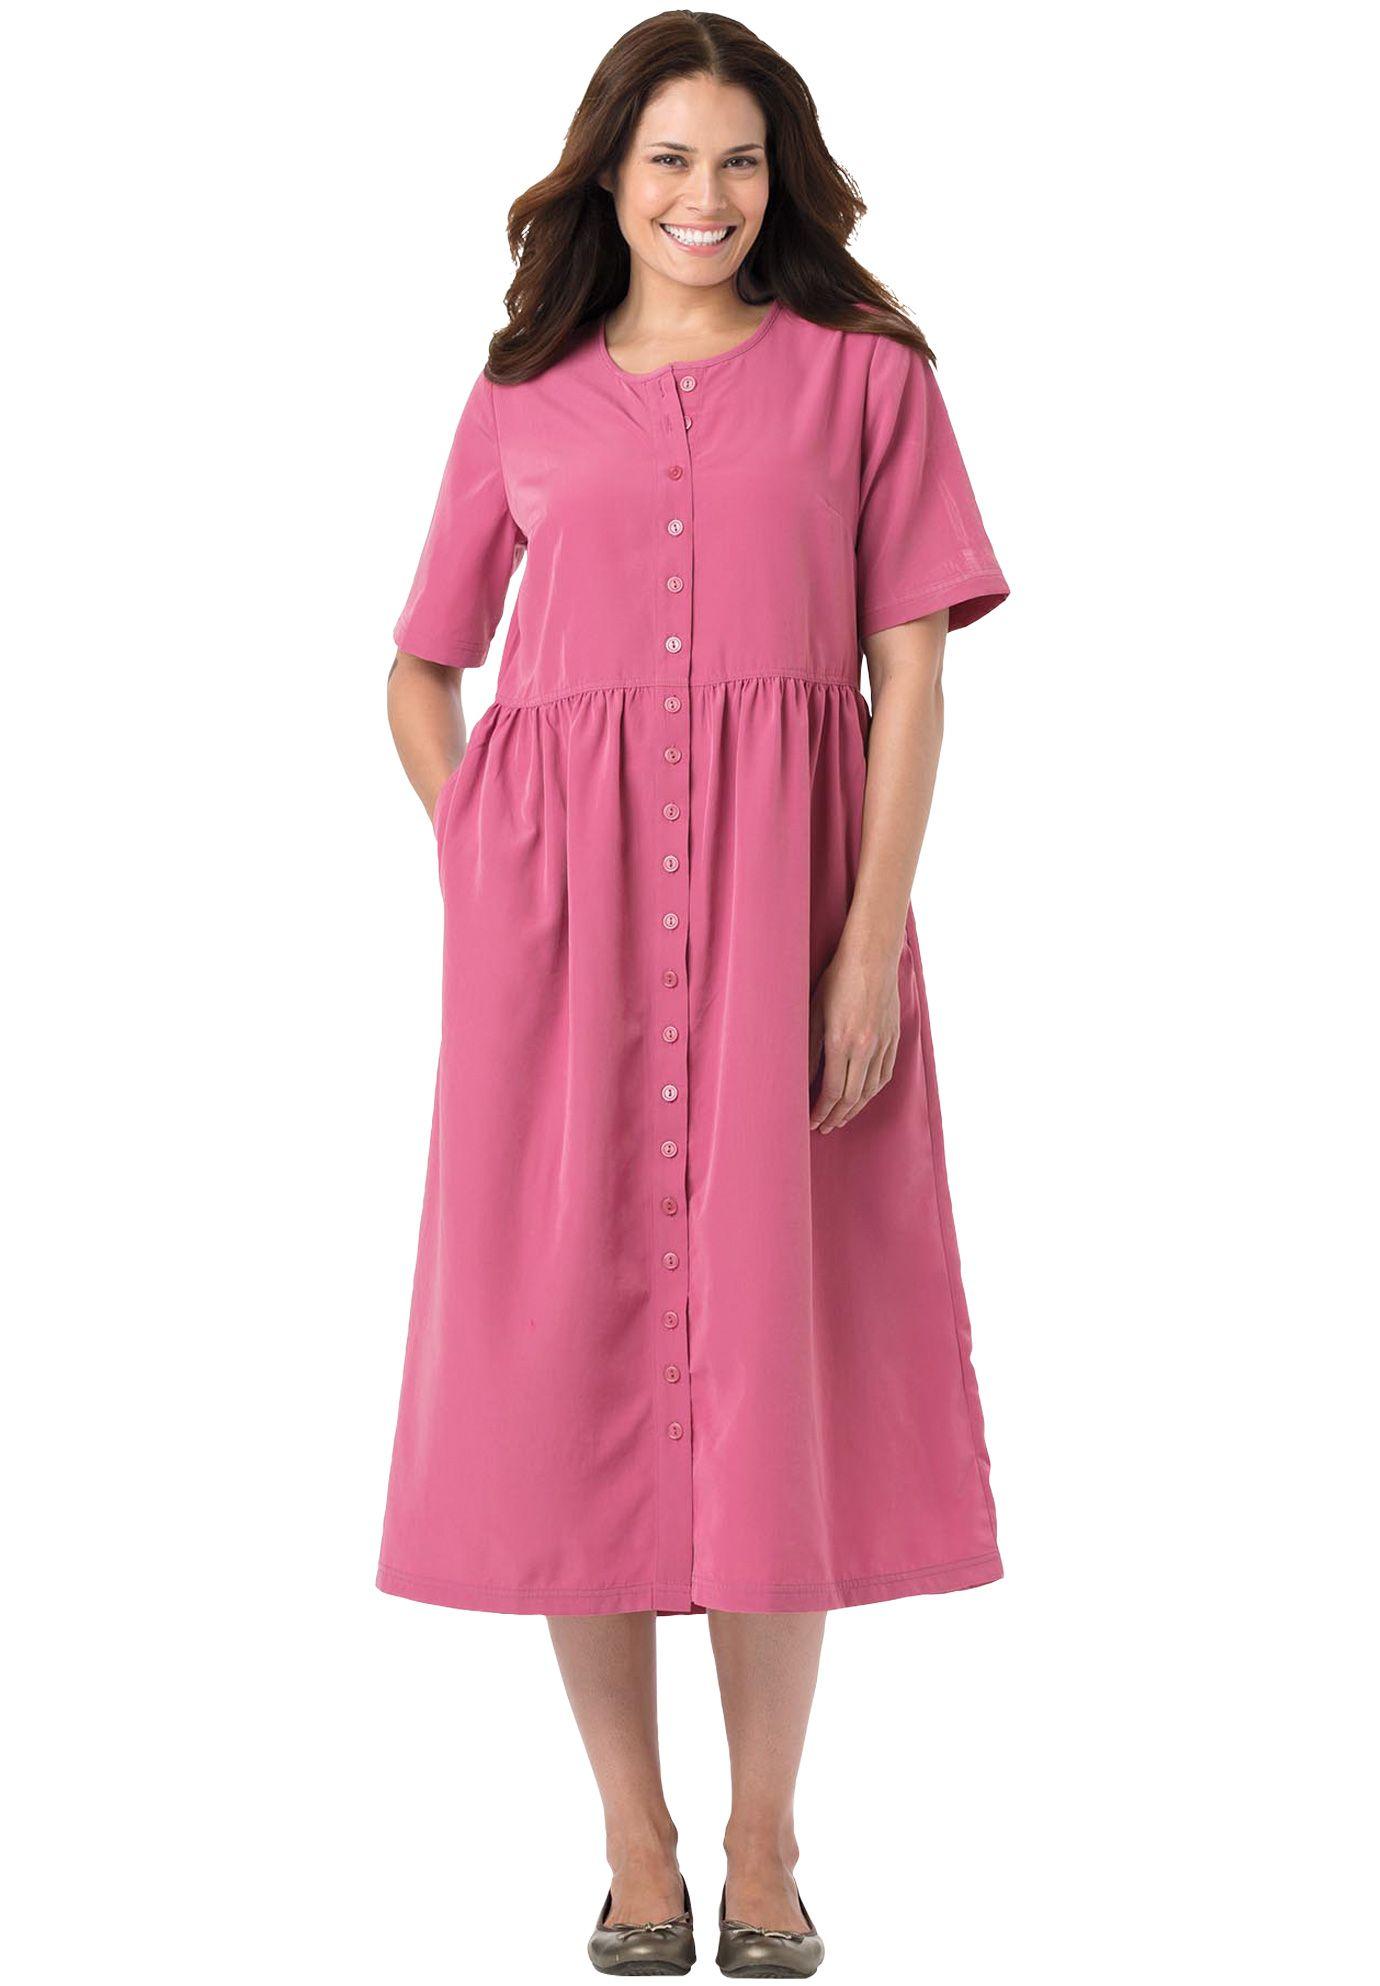 Dress In Silky Peachskin Has Empire Waist Button Front Plus Size